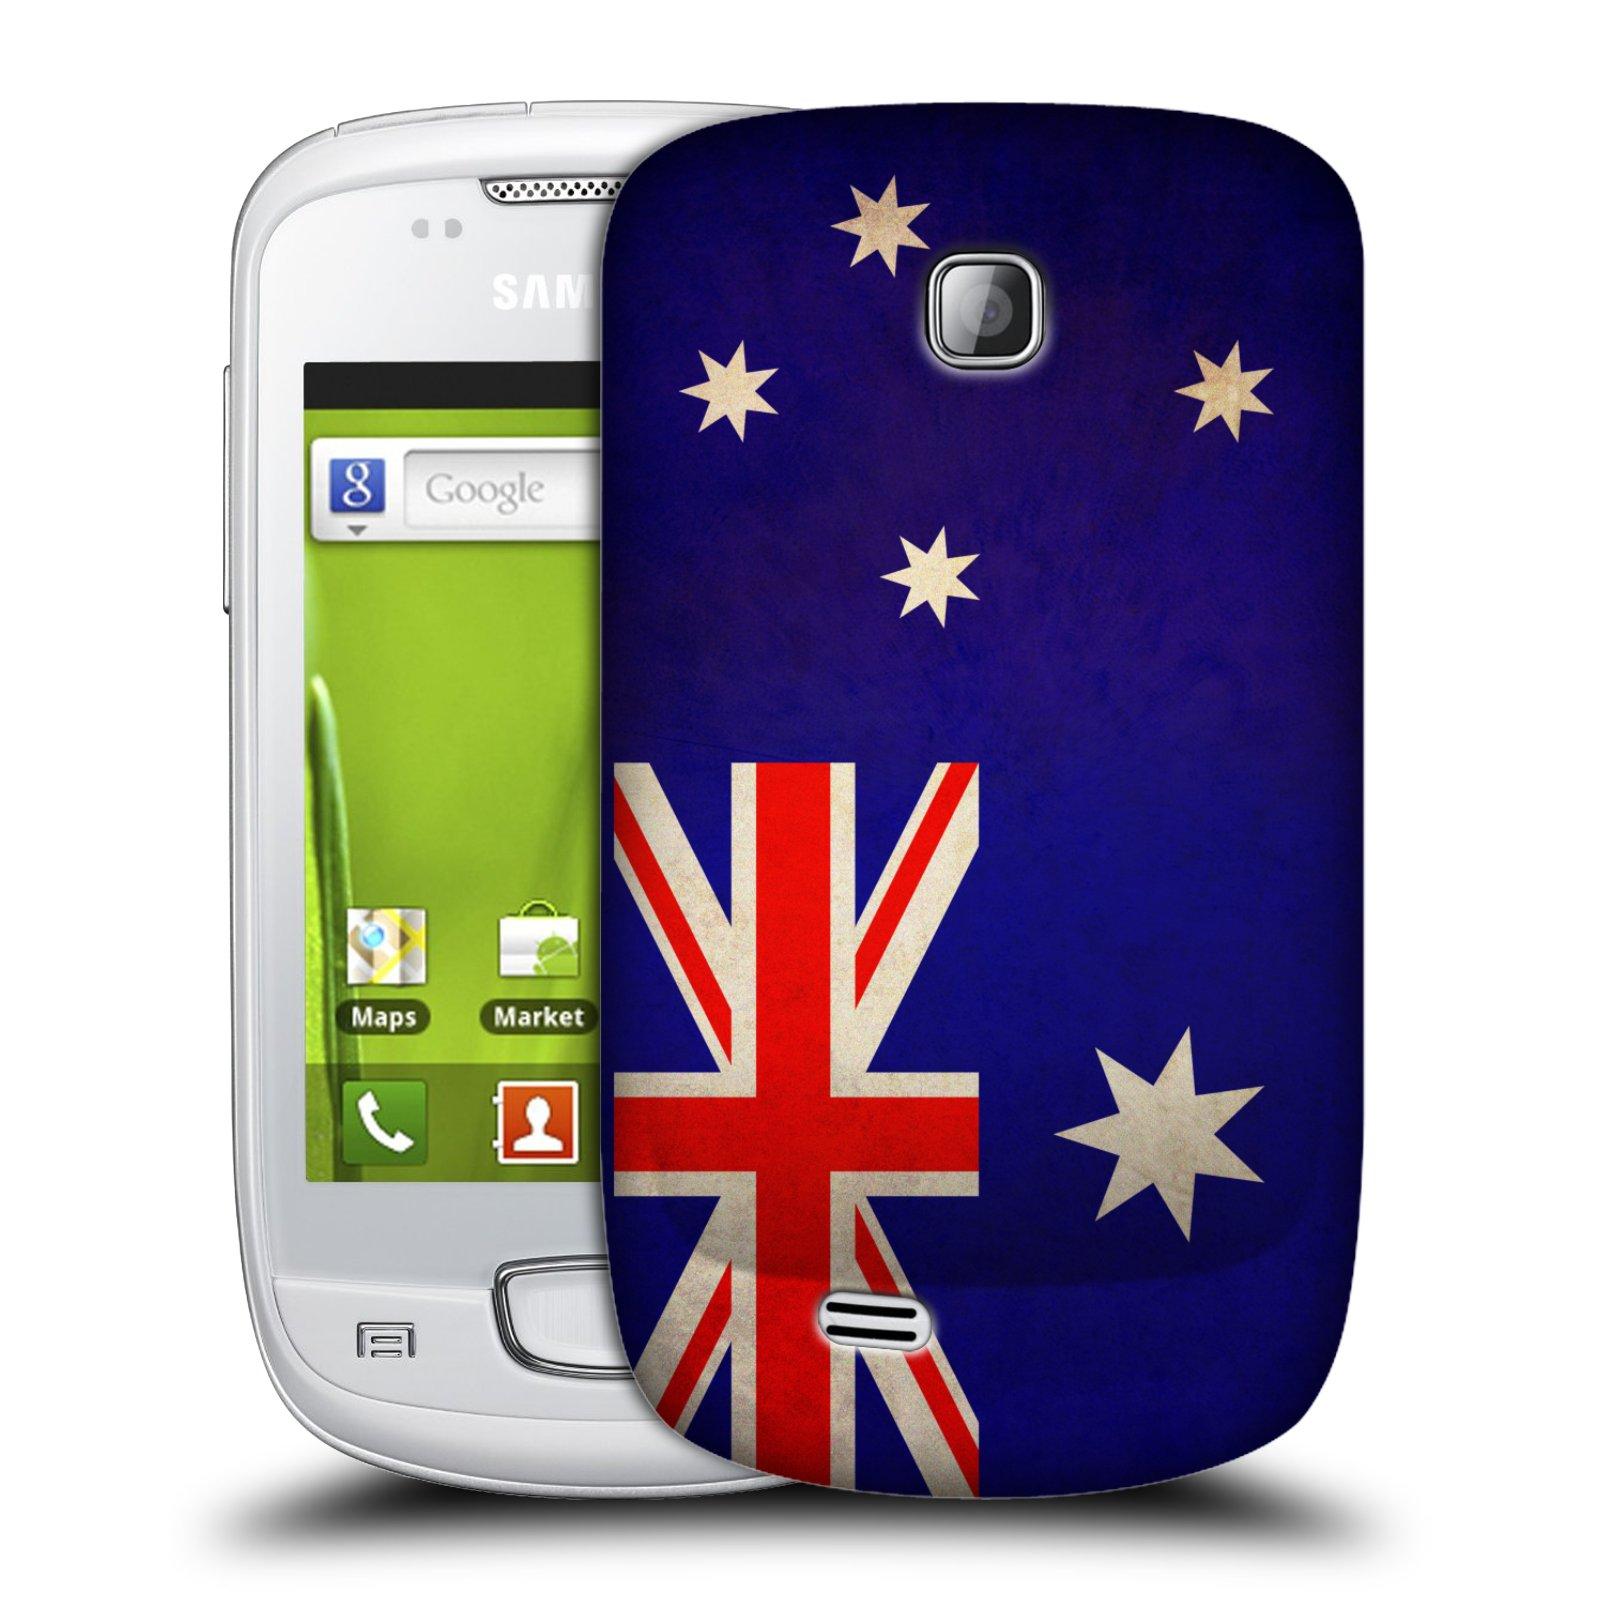 Plastové pouzdro na mobil Samsung Galaxy Mini HEAD CASE VLAJKA AUSTRÁLIE (Kryt či obal na mobilní telefon Samsung Galaxy Mini GT-S5570 / GT-S5570i)